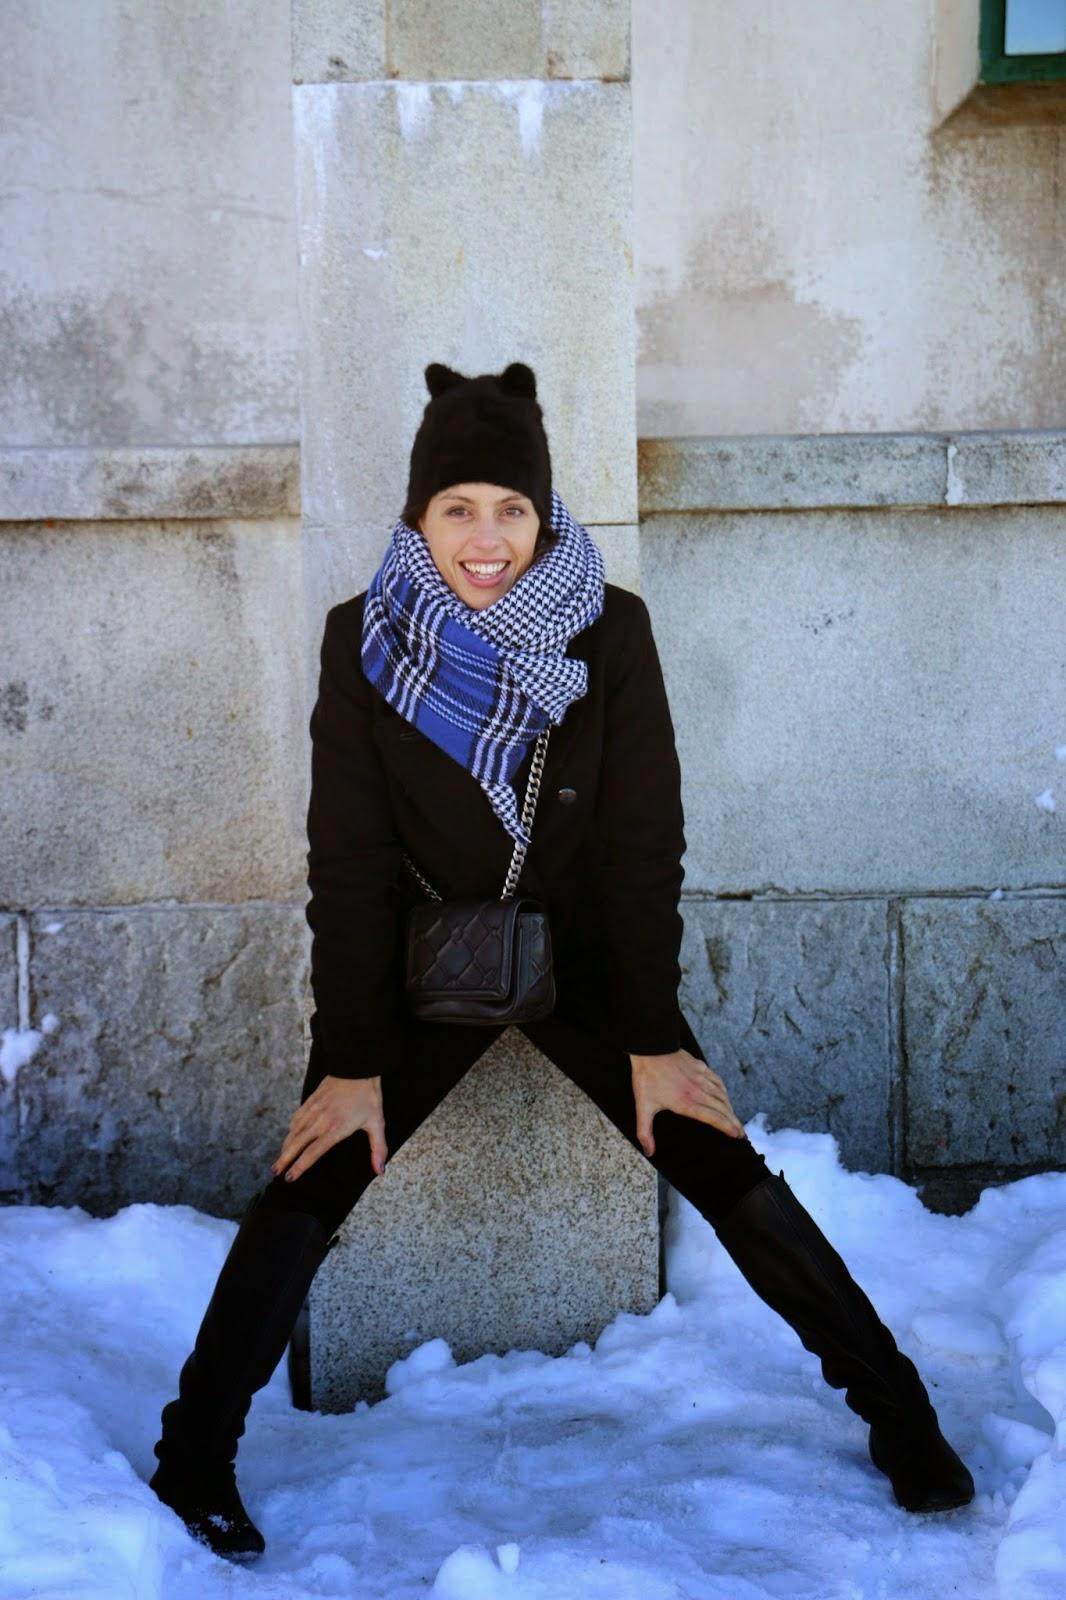 http://ilovefitametrica.blogspot.pt/2014/12/let-it-snow.html